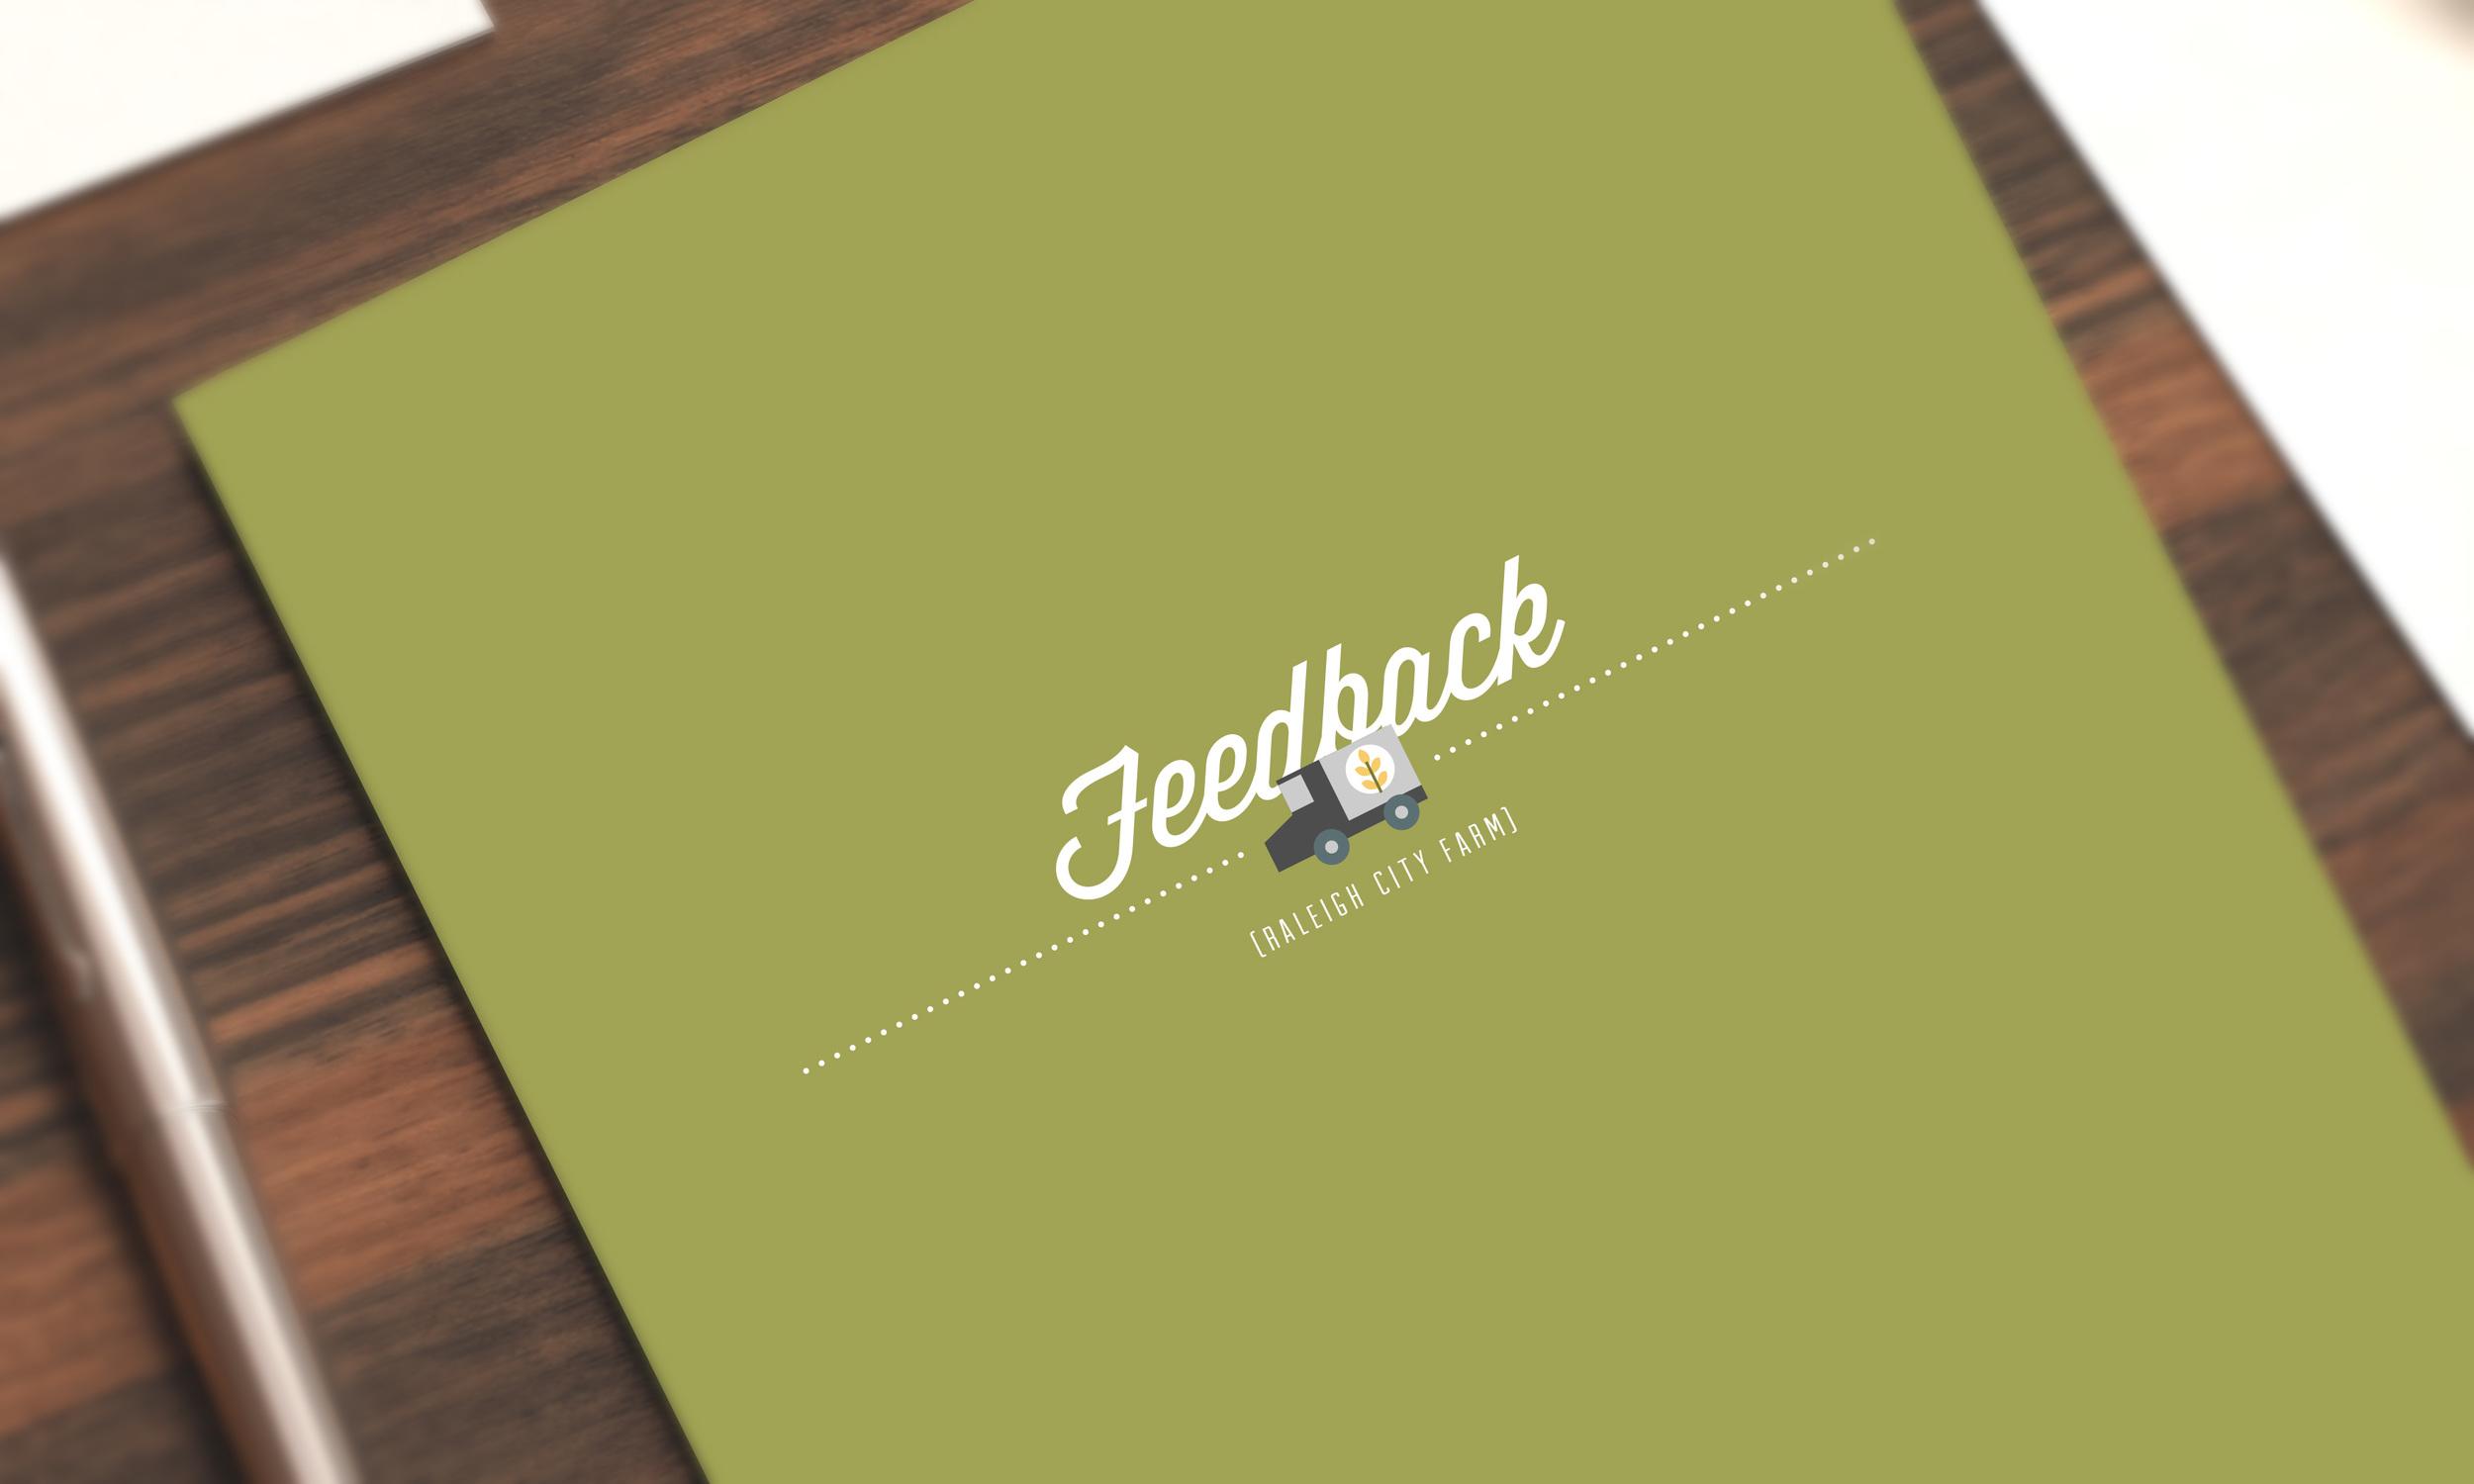 feedback-book.jpg